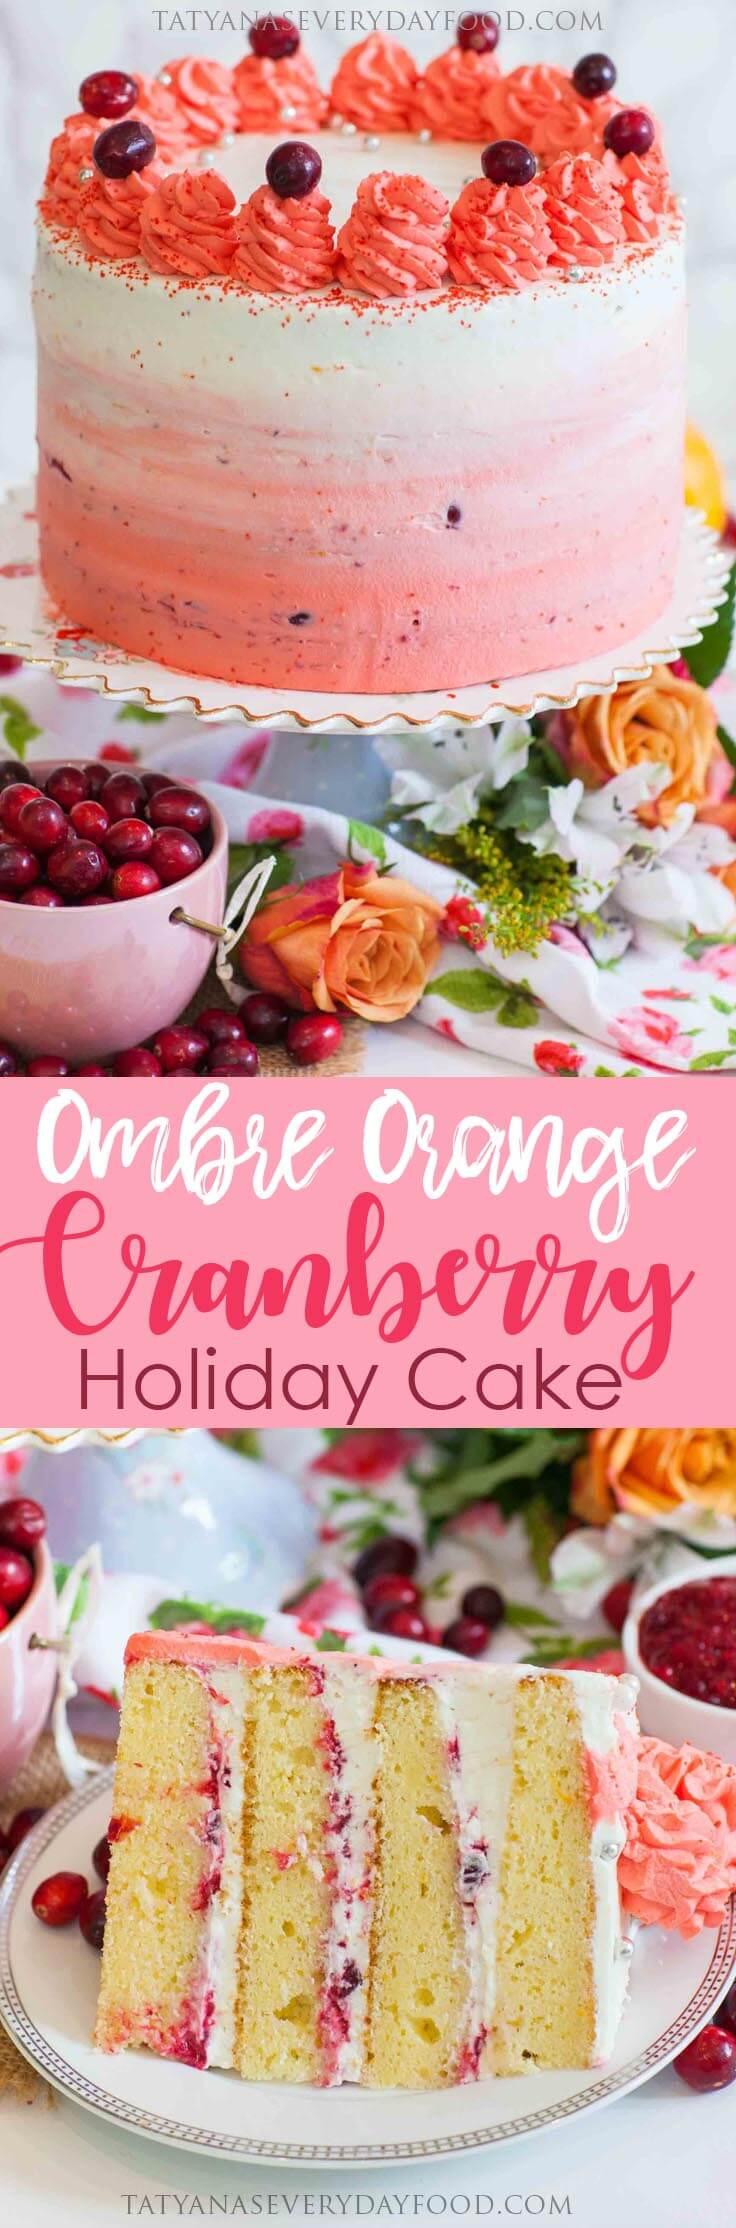 Ombre Orange Cranberry Cake with video recipe